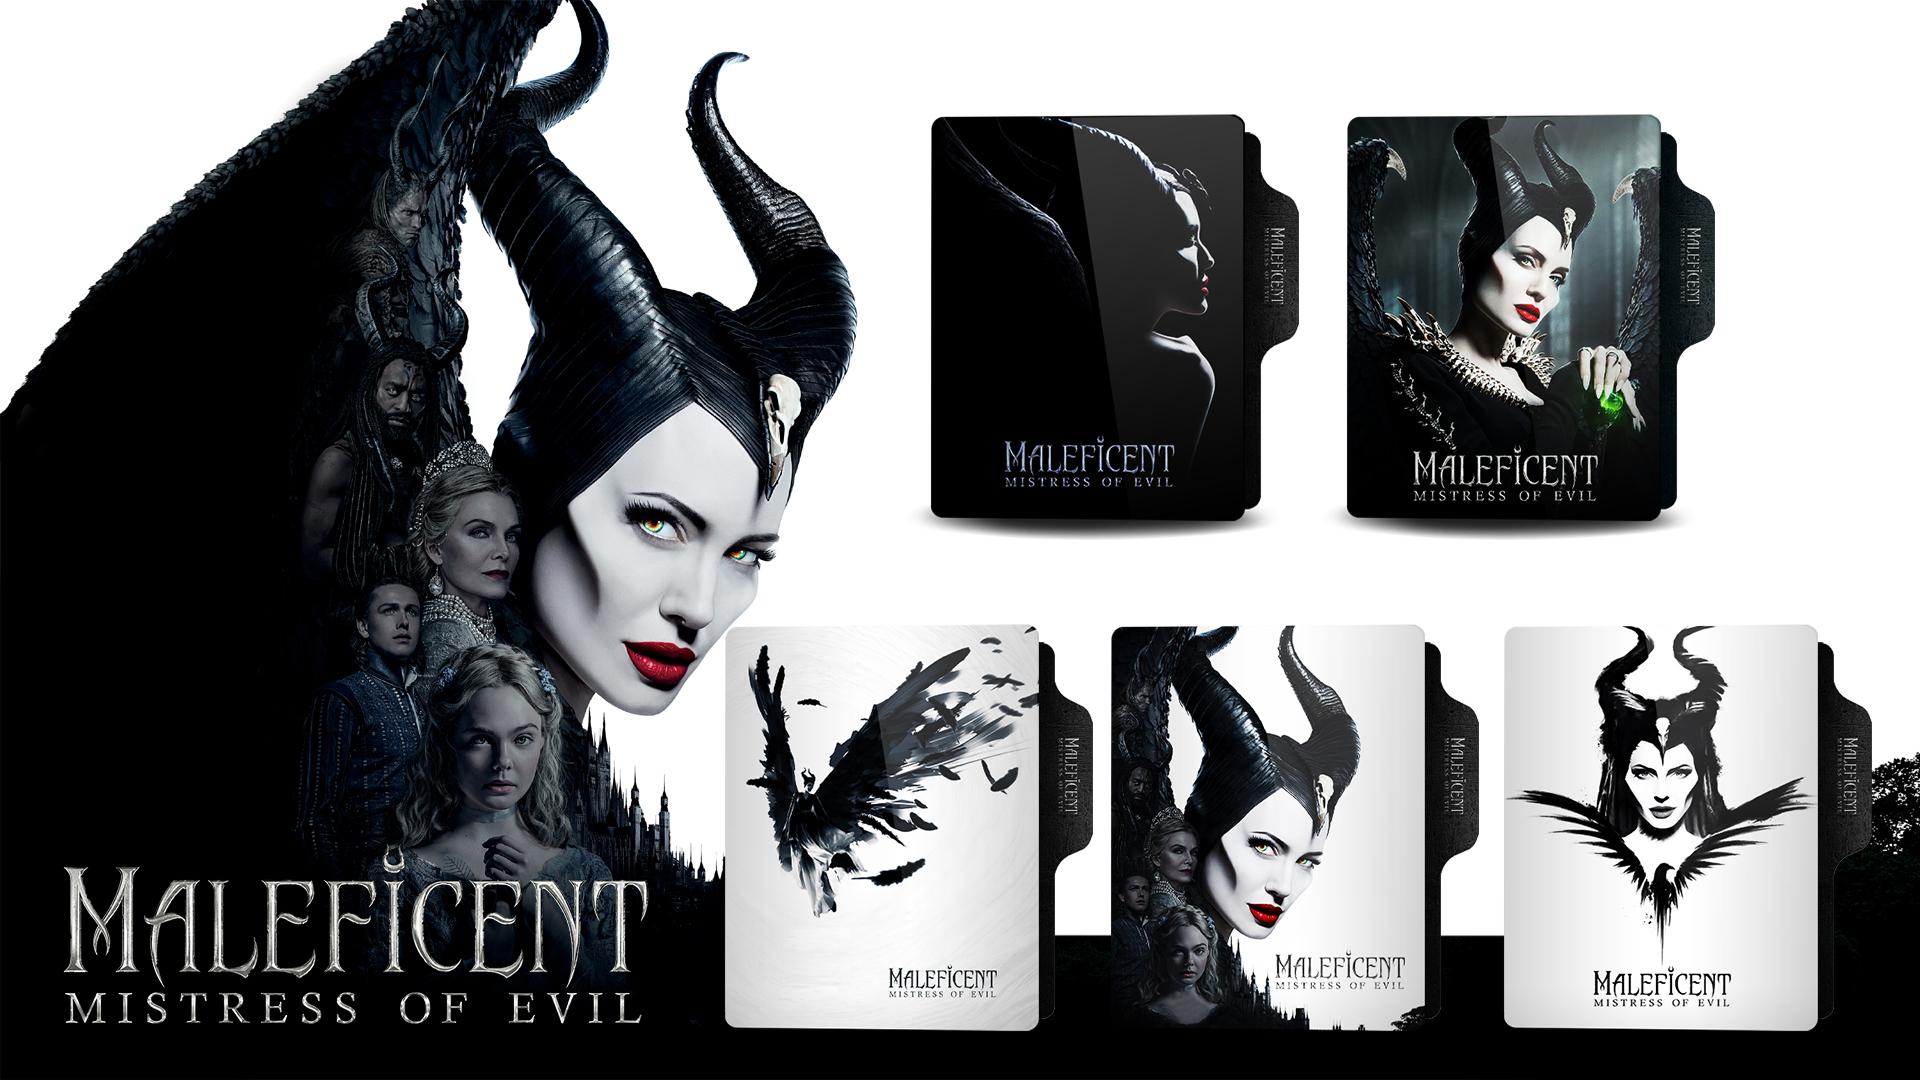 Maleficent Mistress Of Evil 2019 Folder Icon By Mena7 On Deviantart